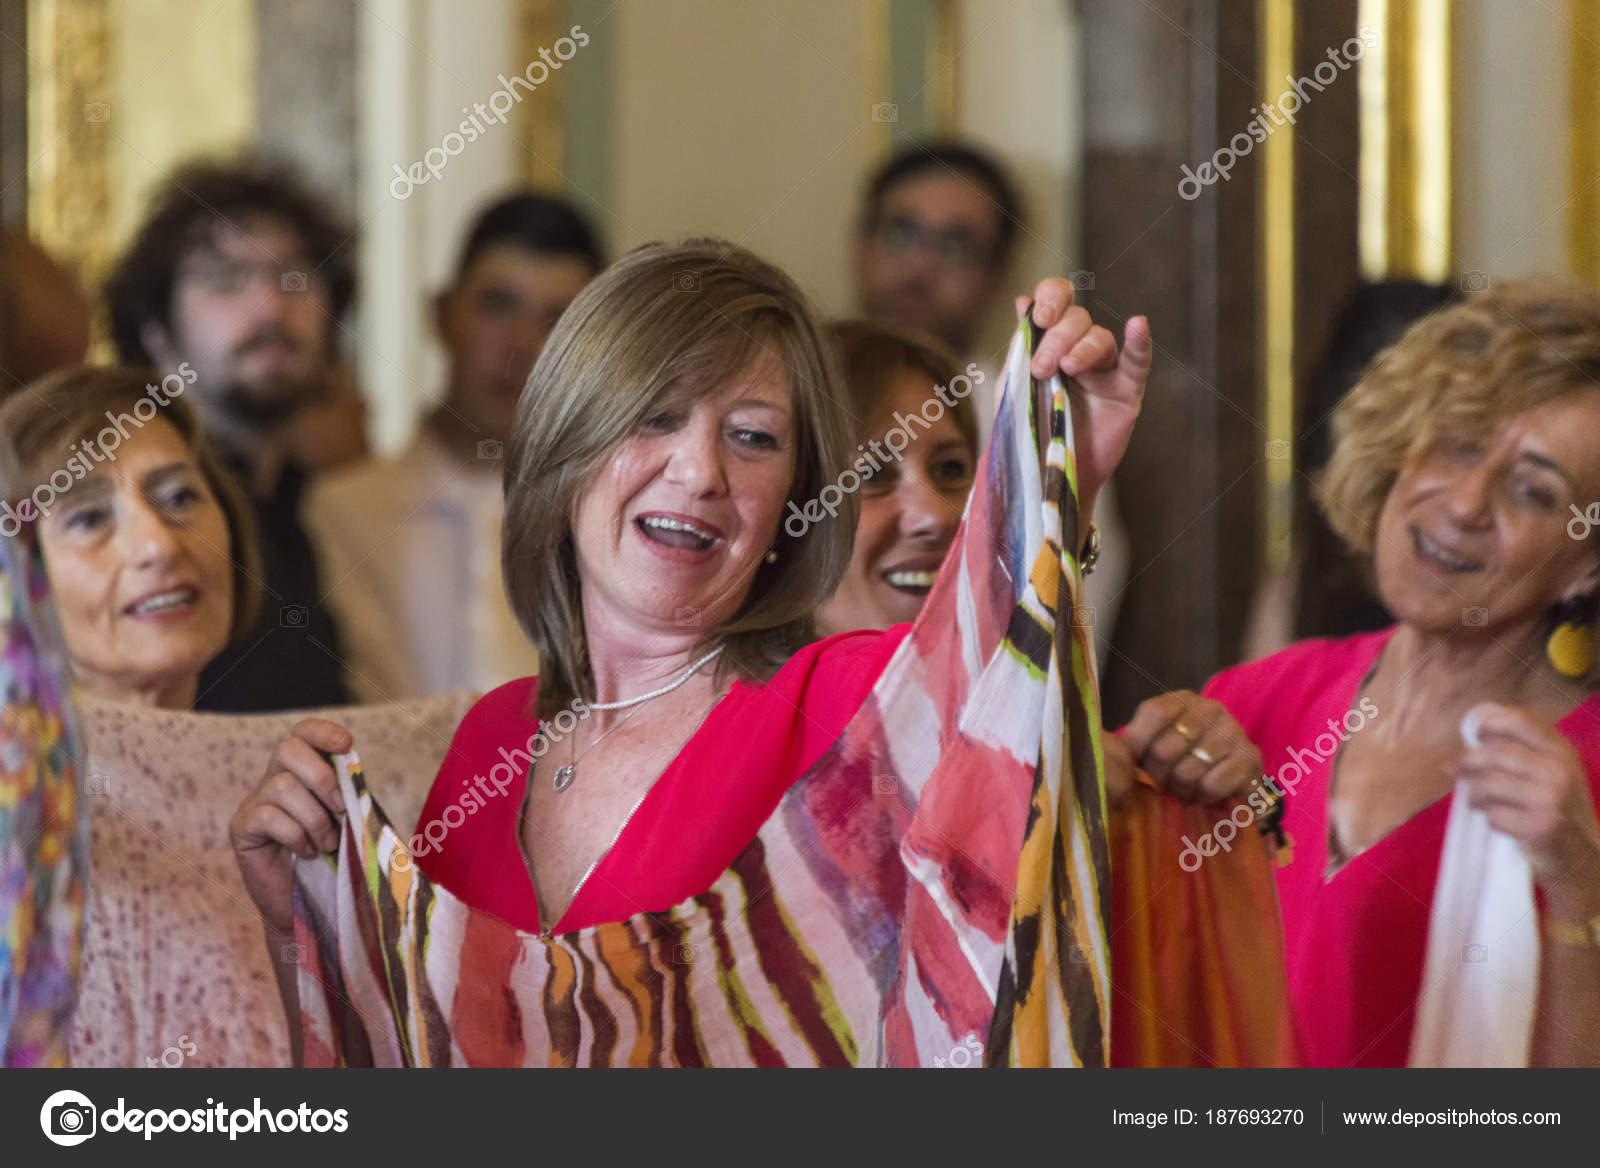 Amateur women singing